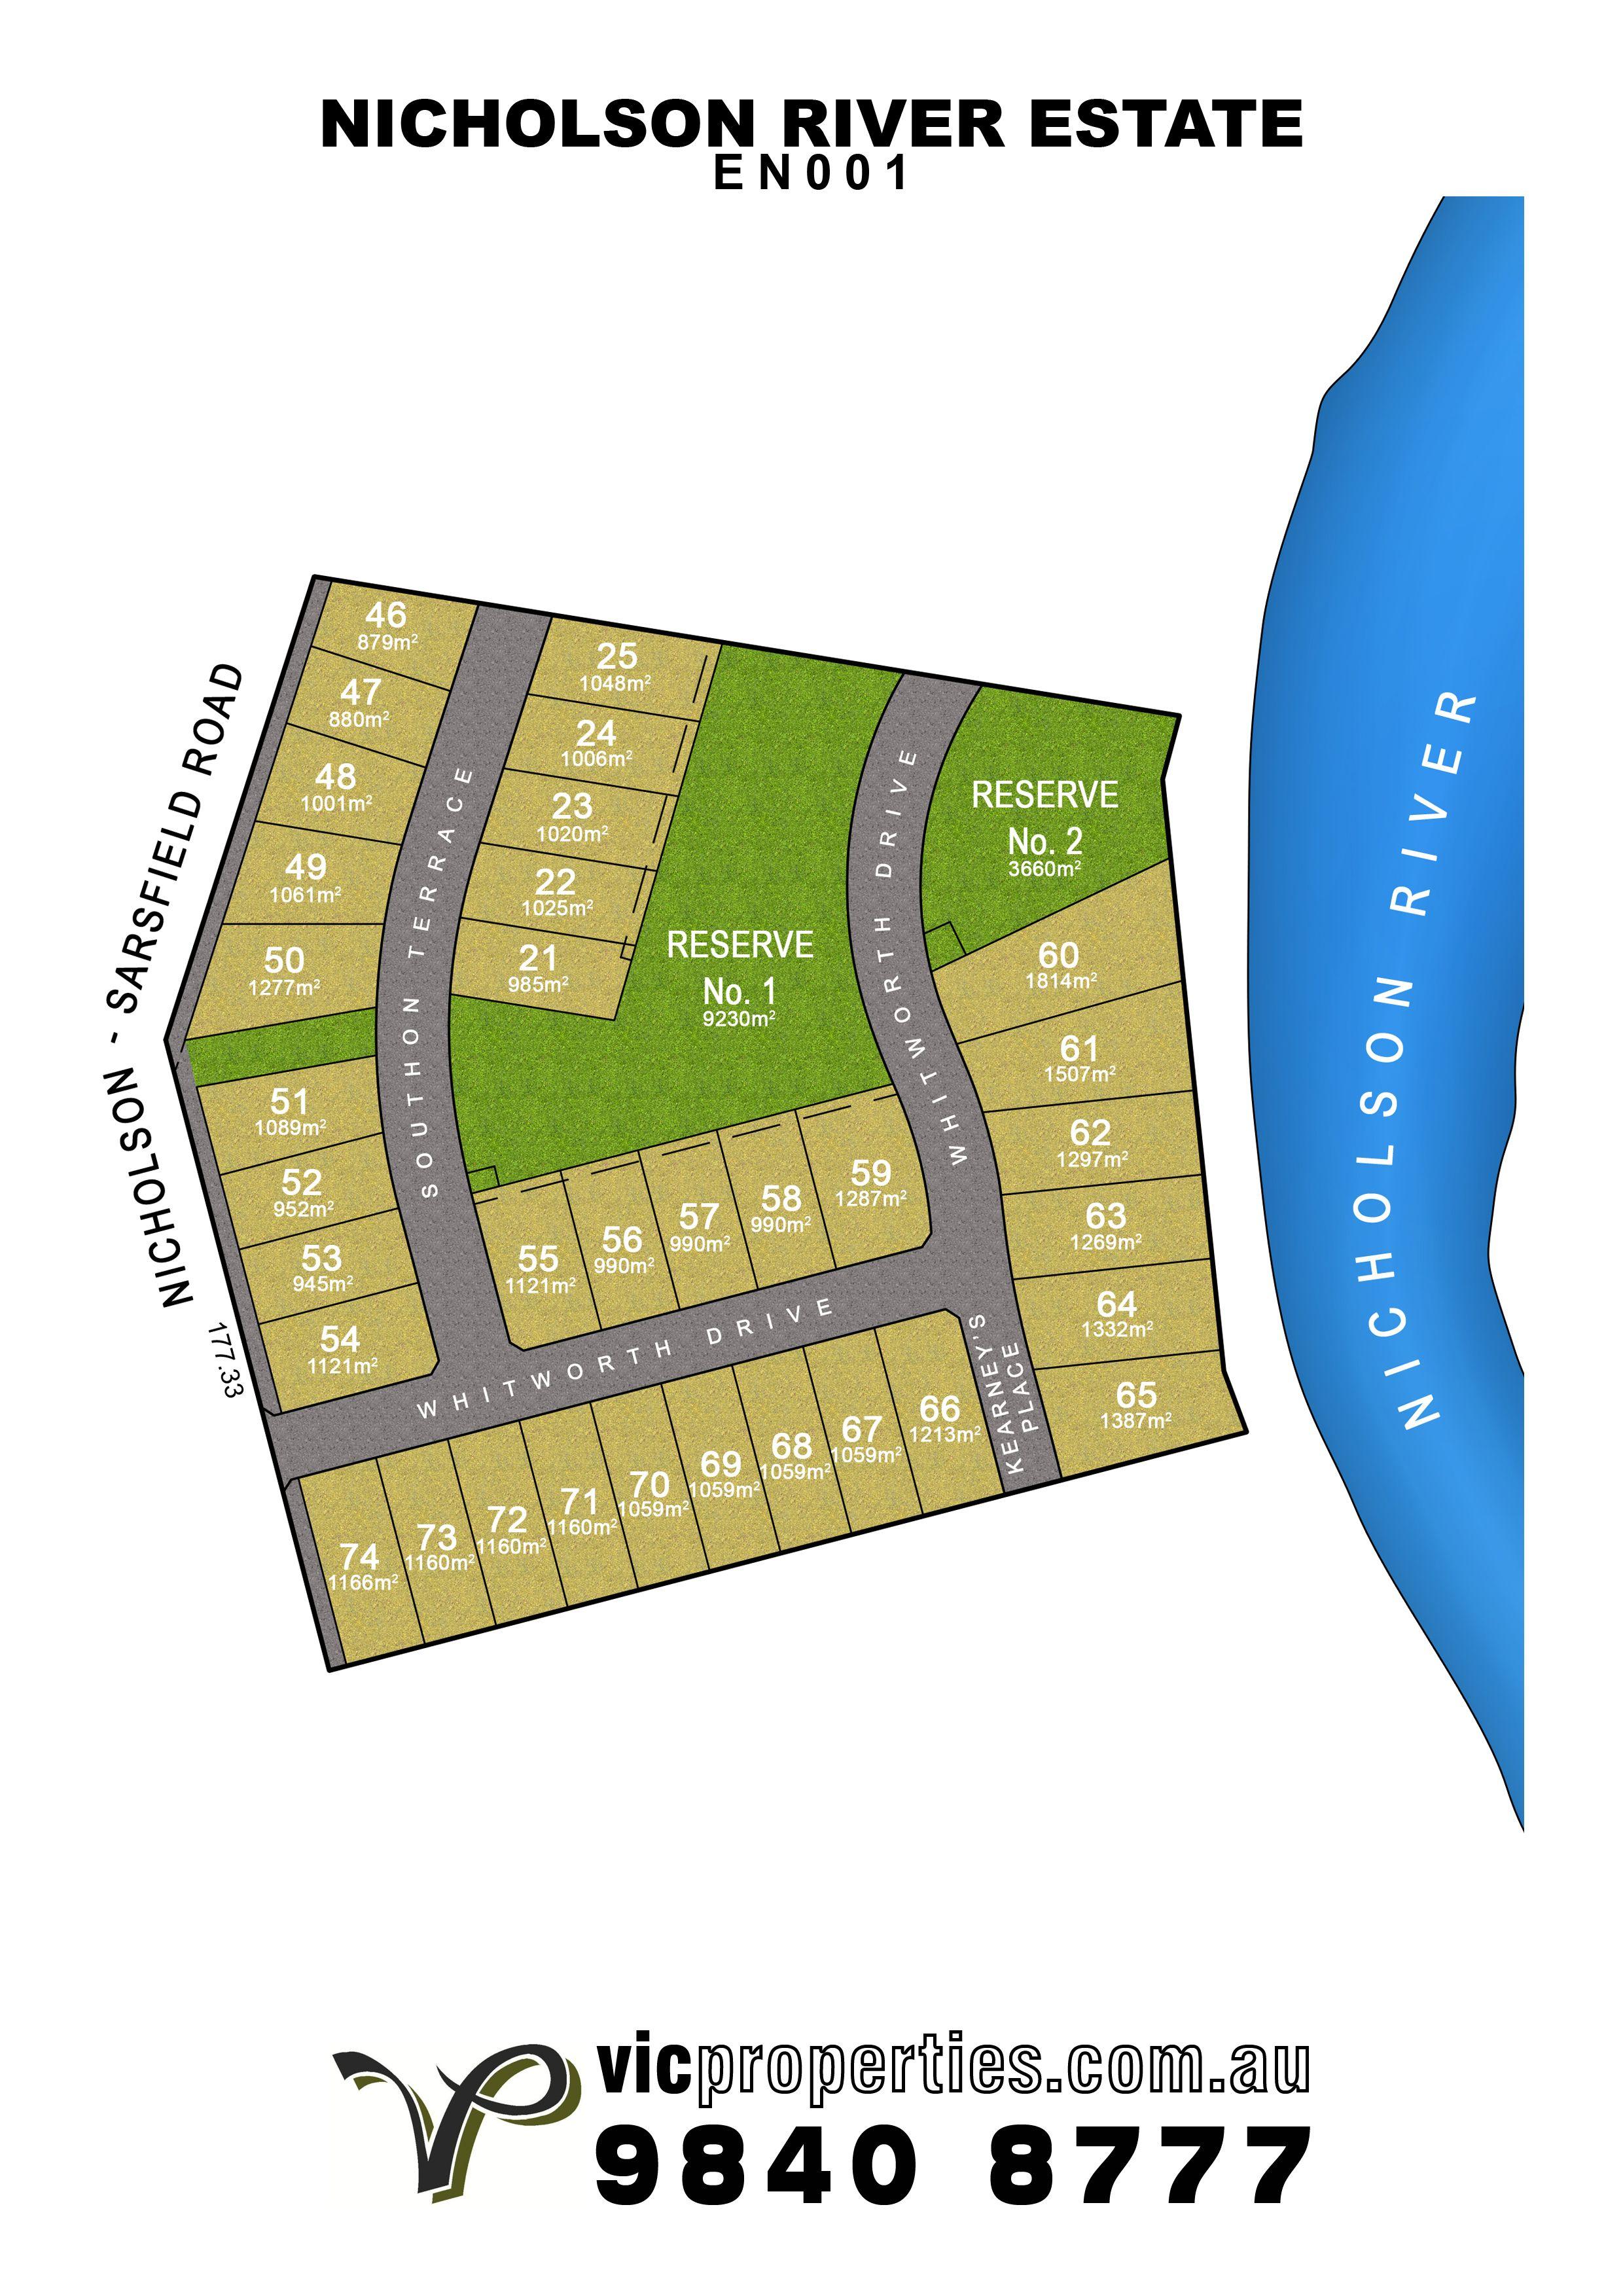 Lot 63/20 Whitworth Drive, Nicholson VIC 3882